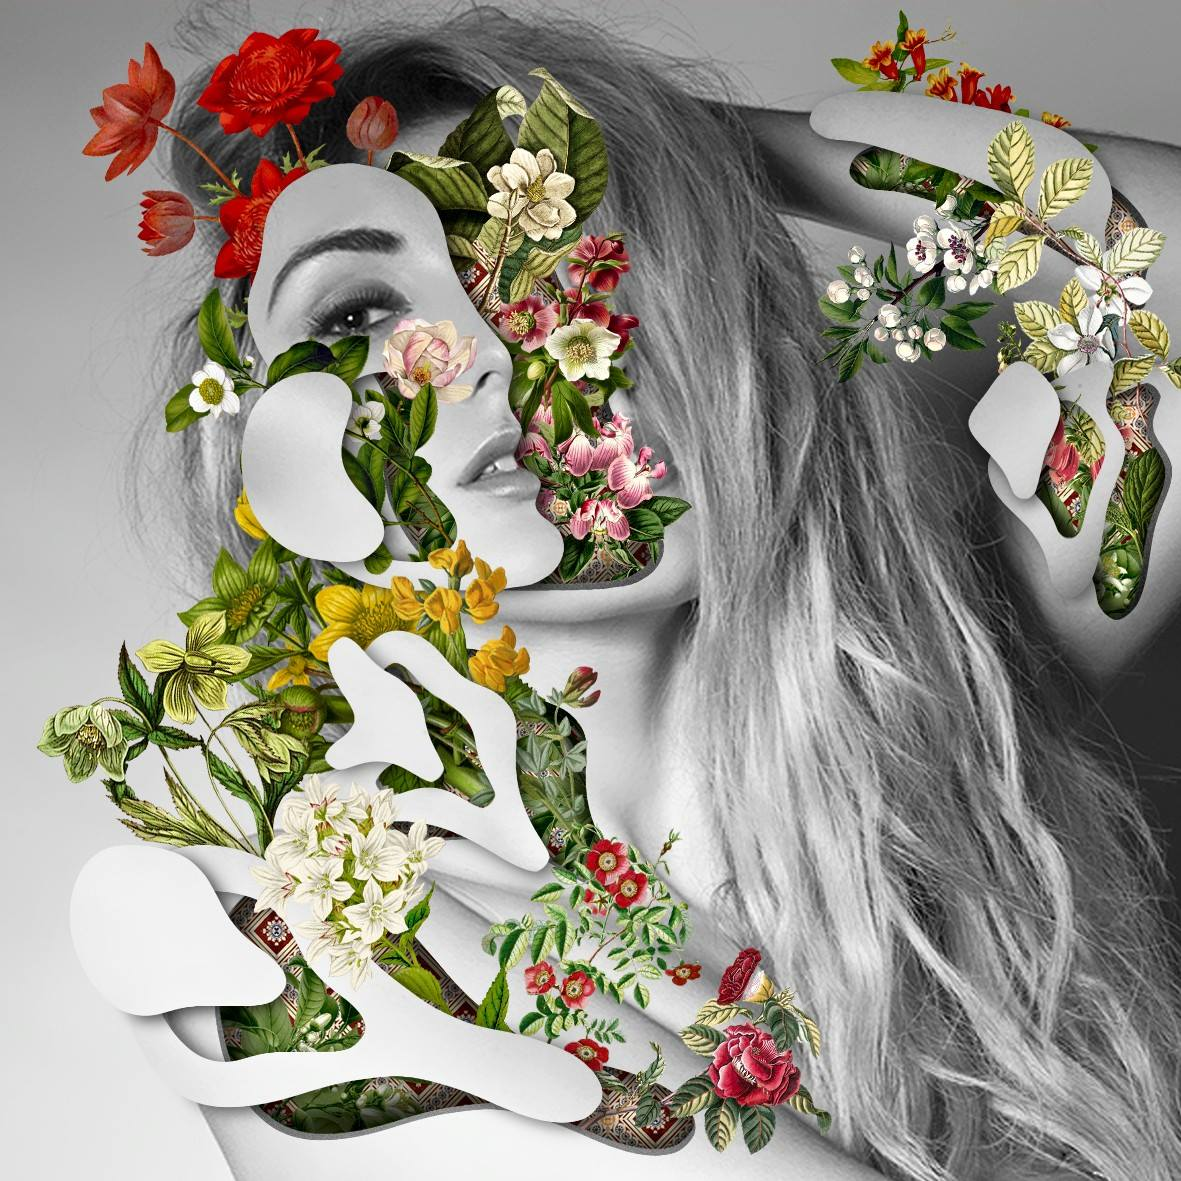 Collage Visage Fleur 03 La Boite Verte